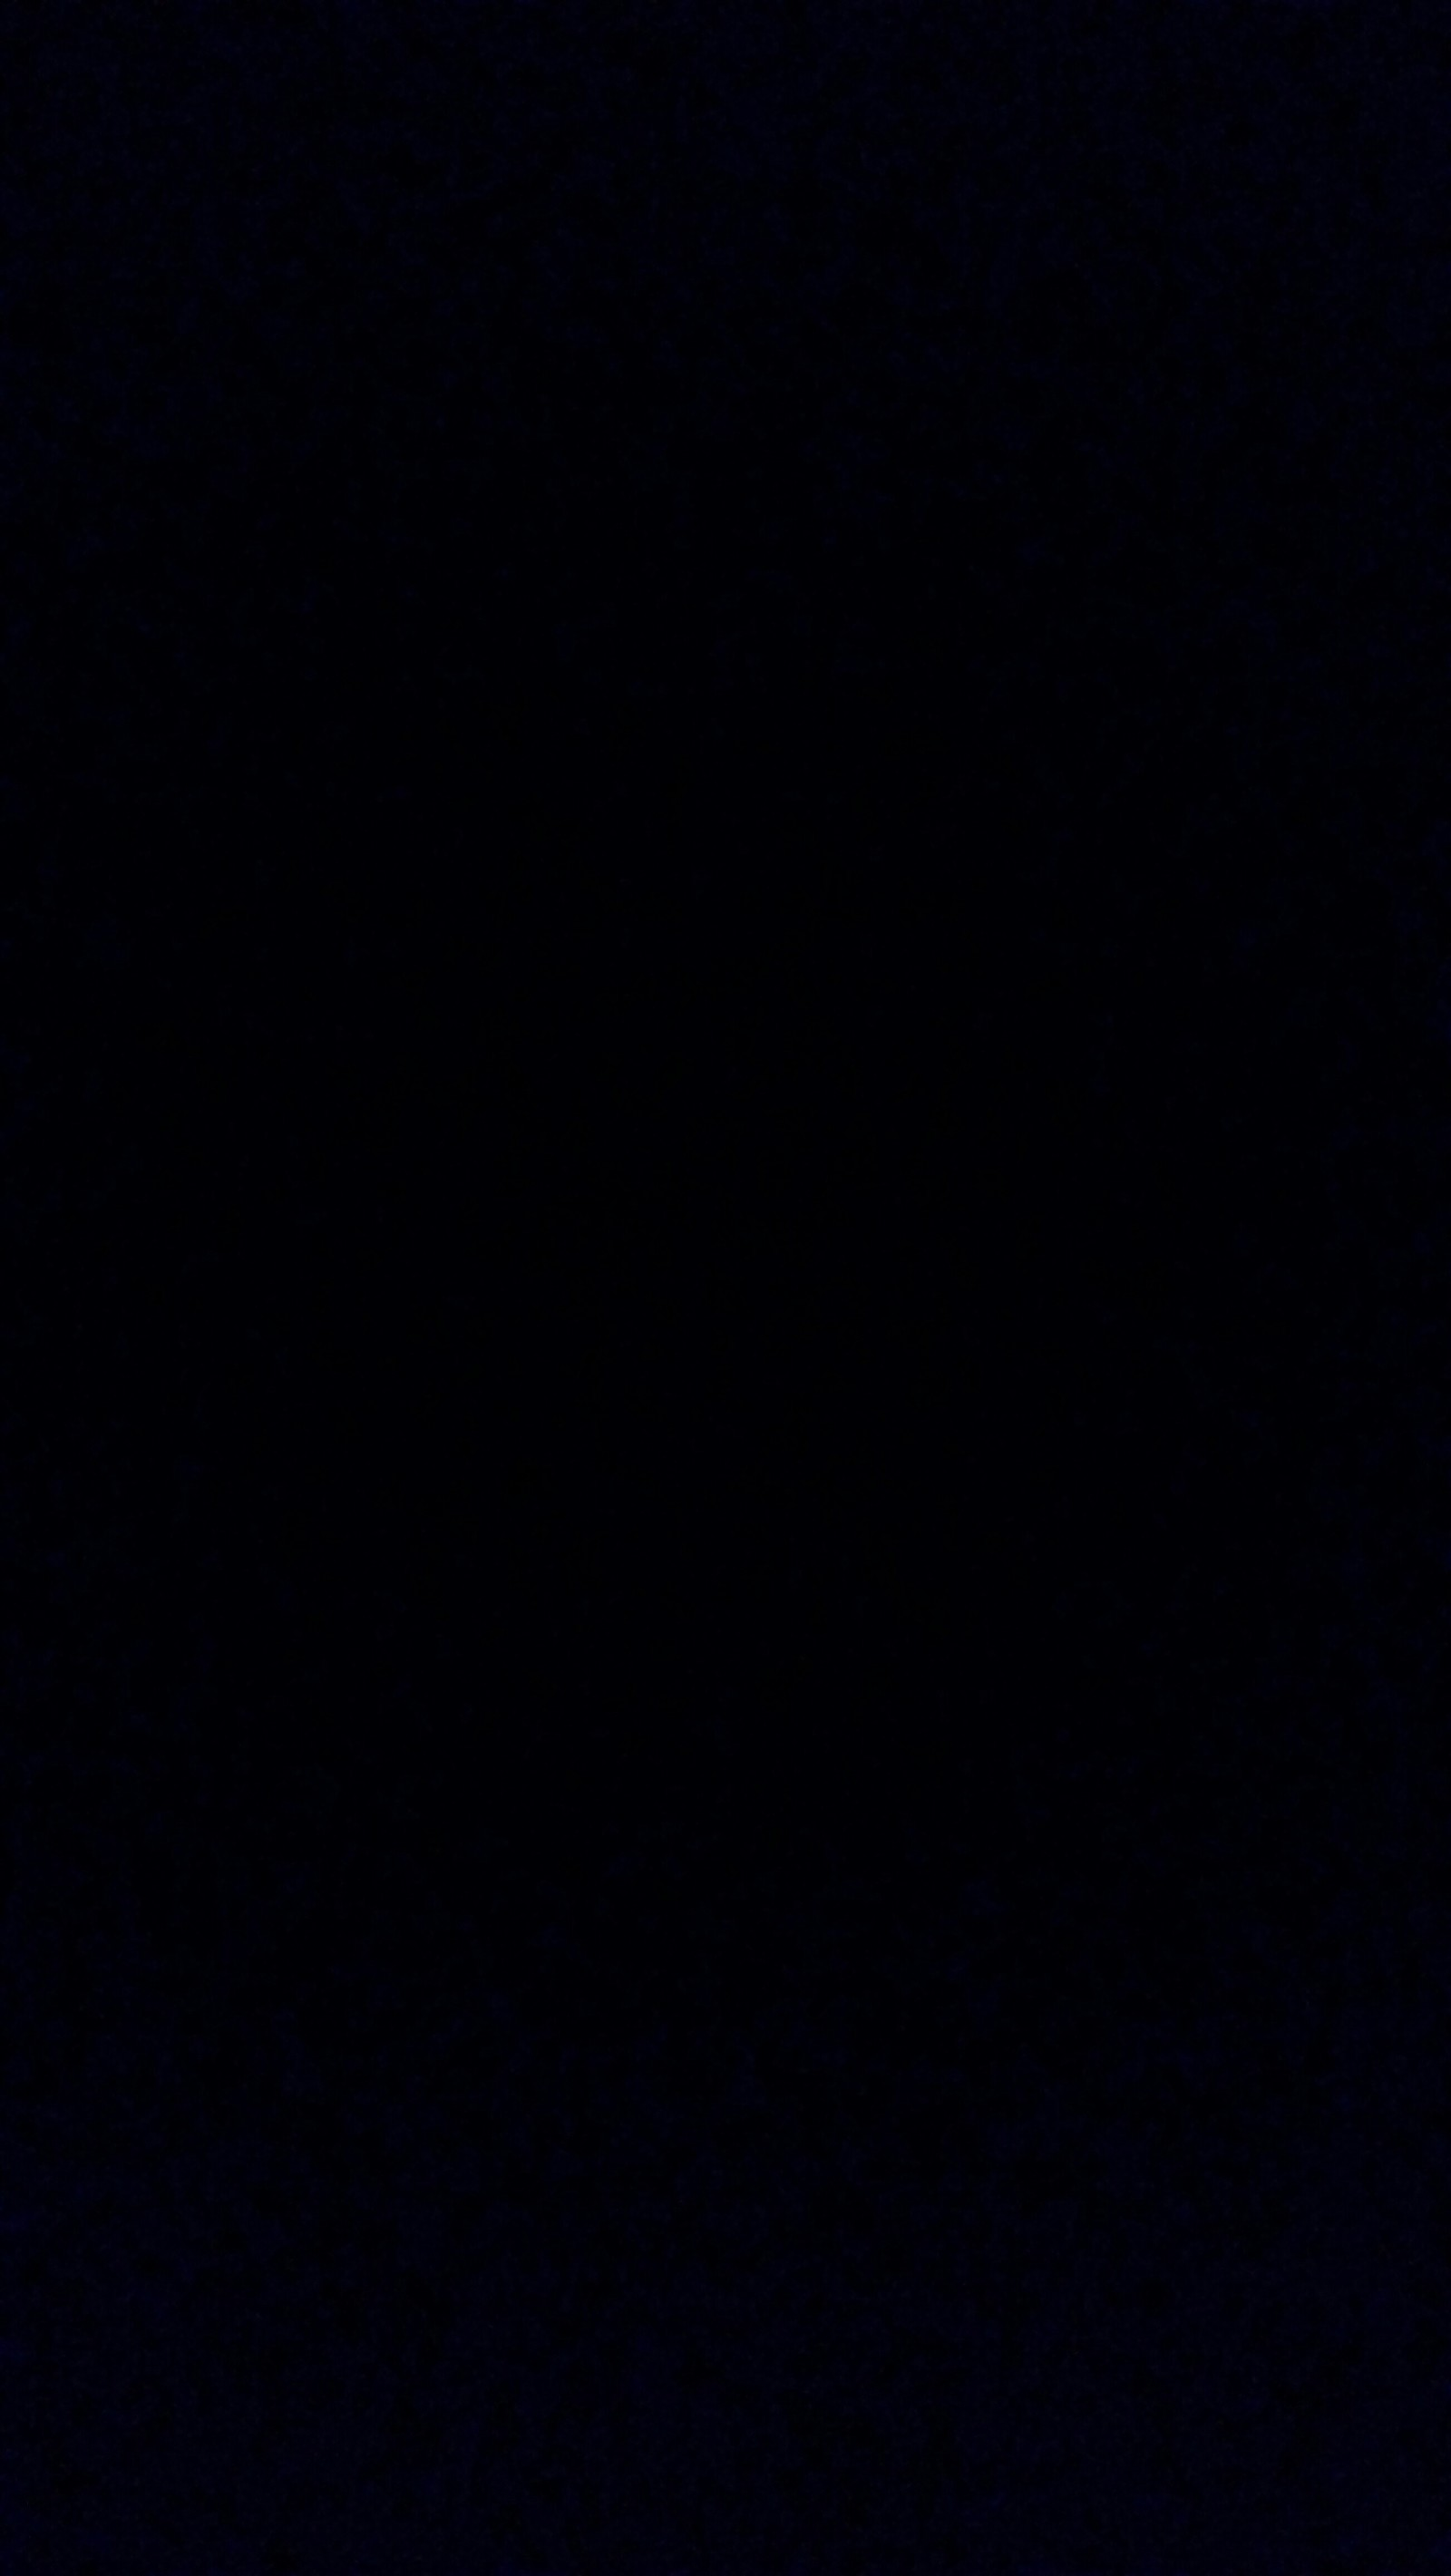 Темнота — википедия. что такое темнота